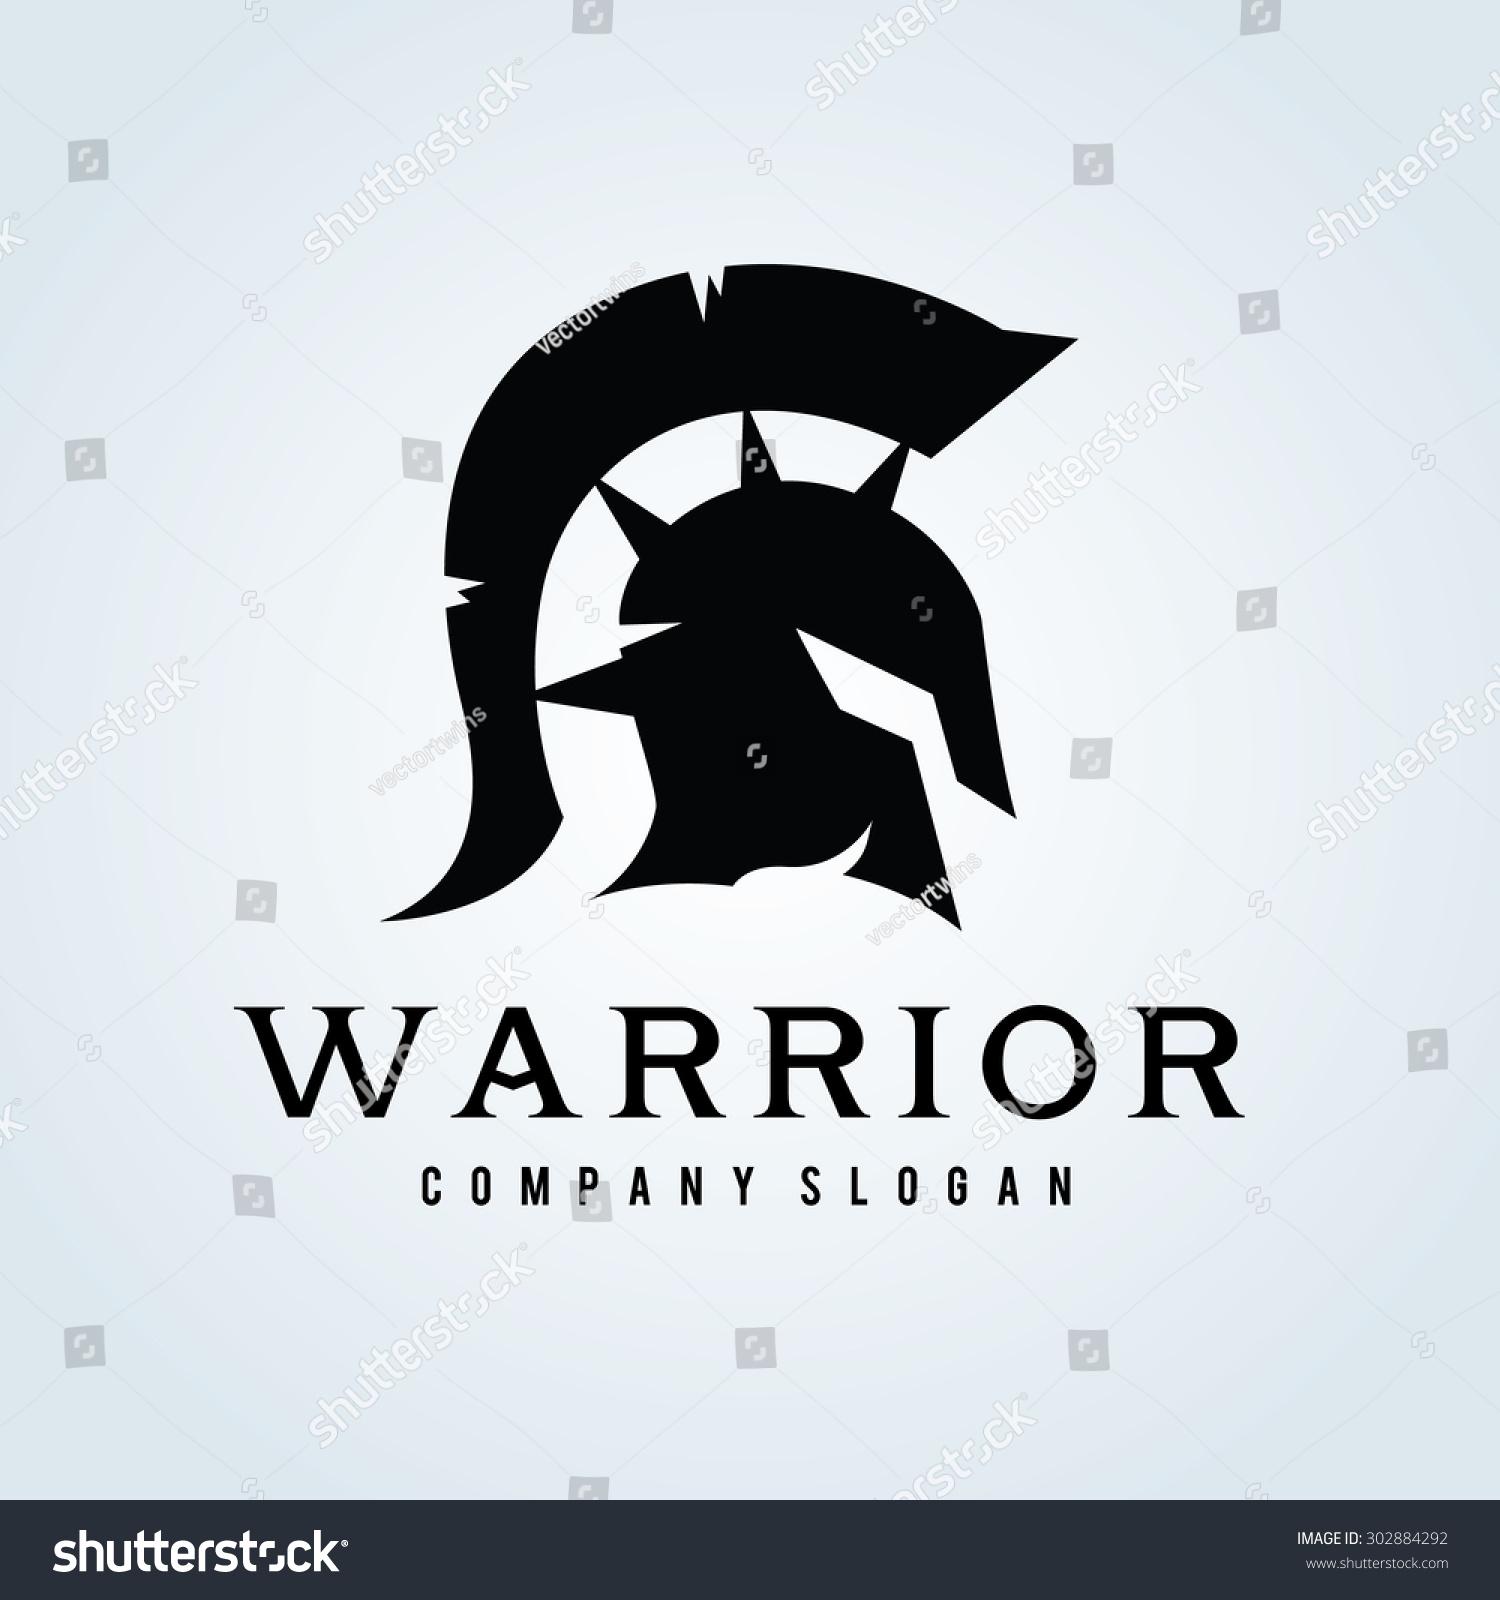 warrior logorock logoarmy logogame game logovector stock vector 302884292 shutterstock. Black Bedroom Furniture Sets. Home Design Ideas